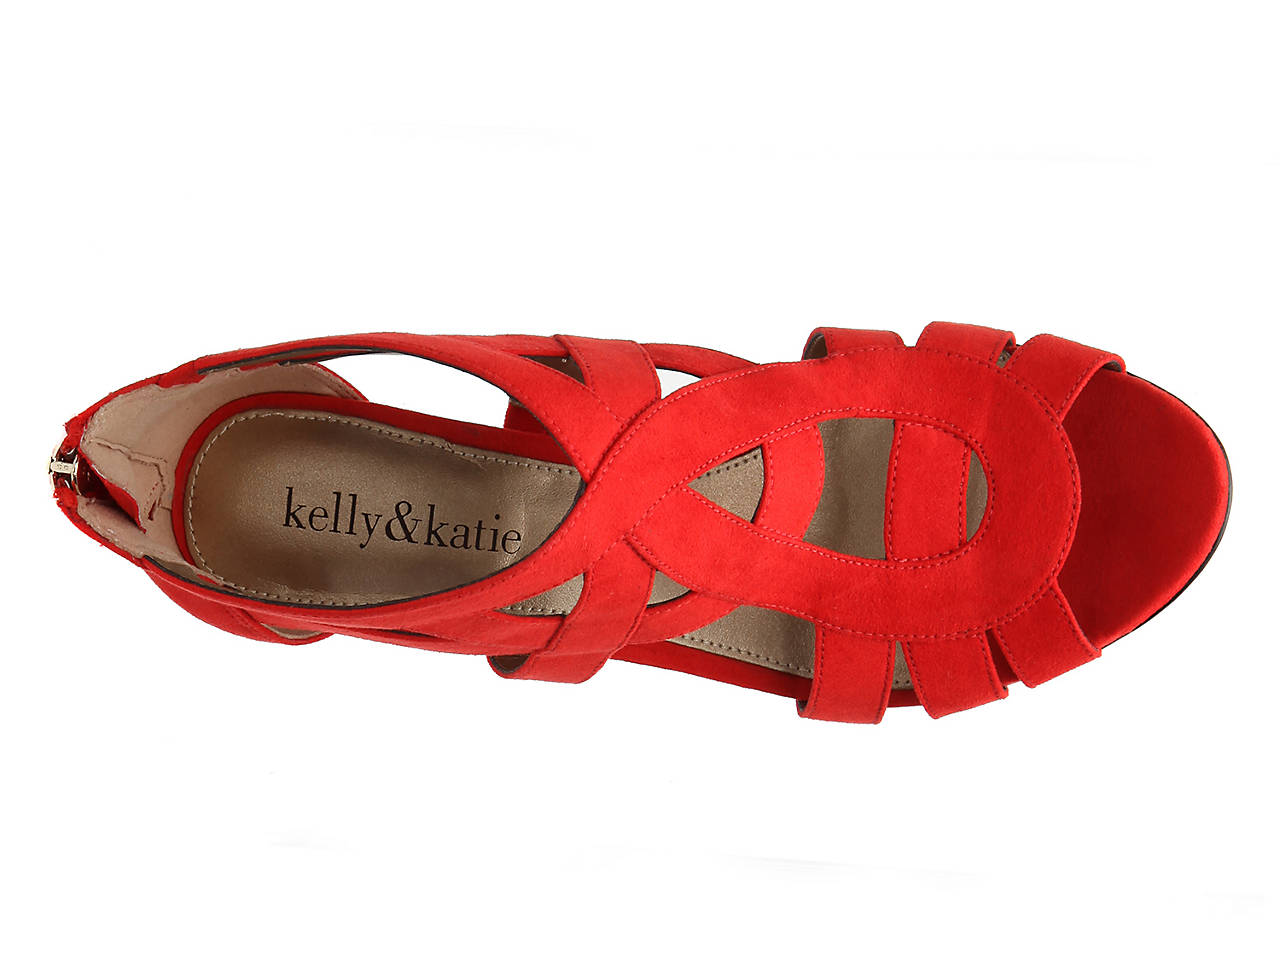 8ded1fcb0a0c Kelly   Katie Catrin Sandal Women s Shoes